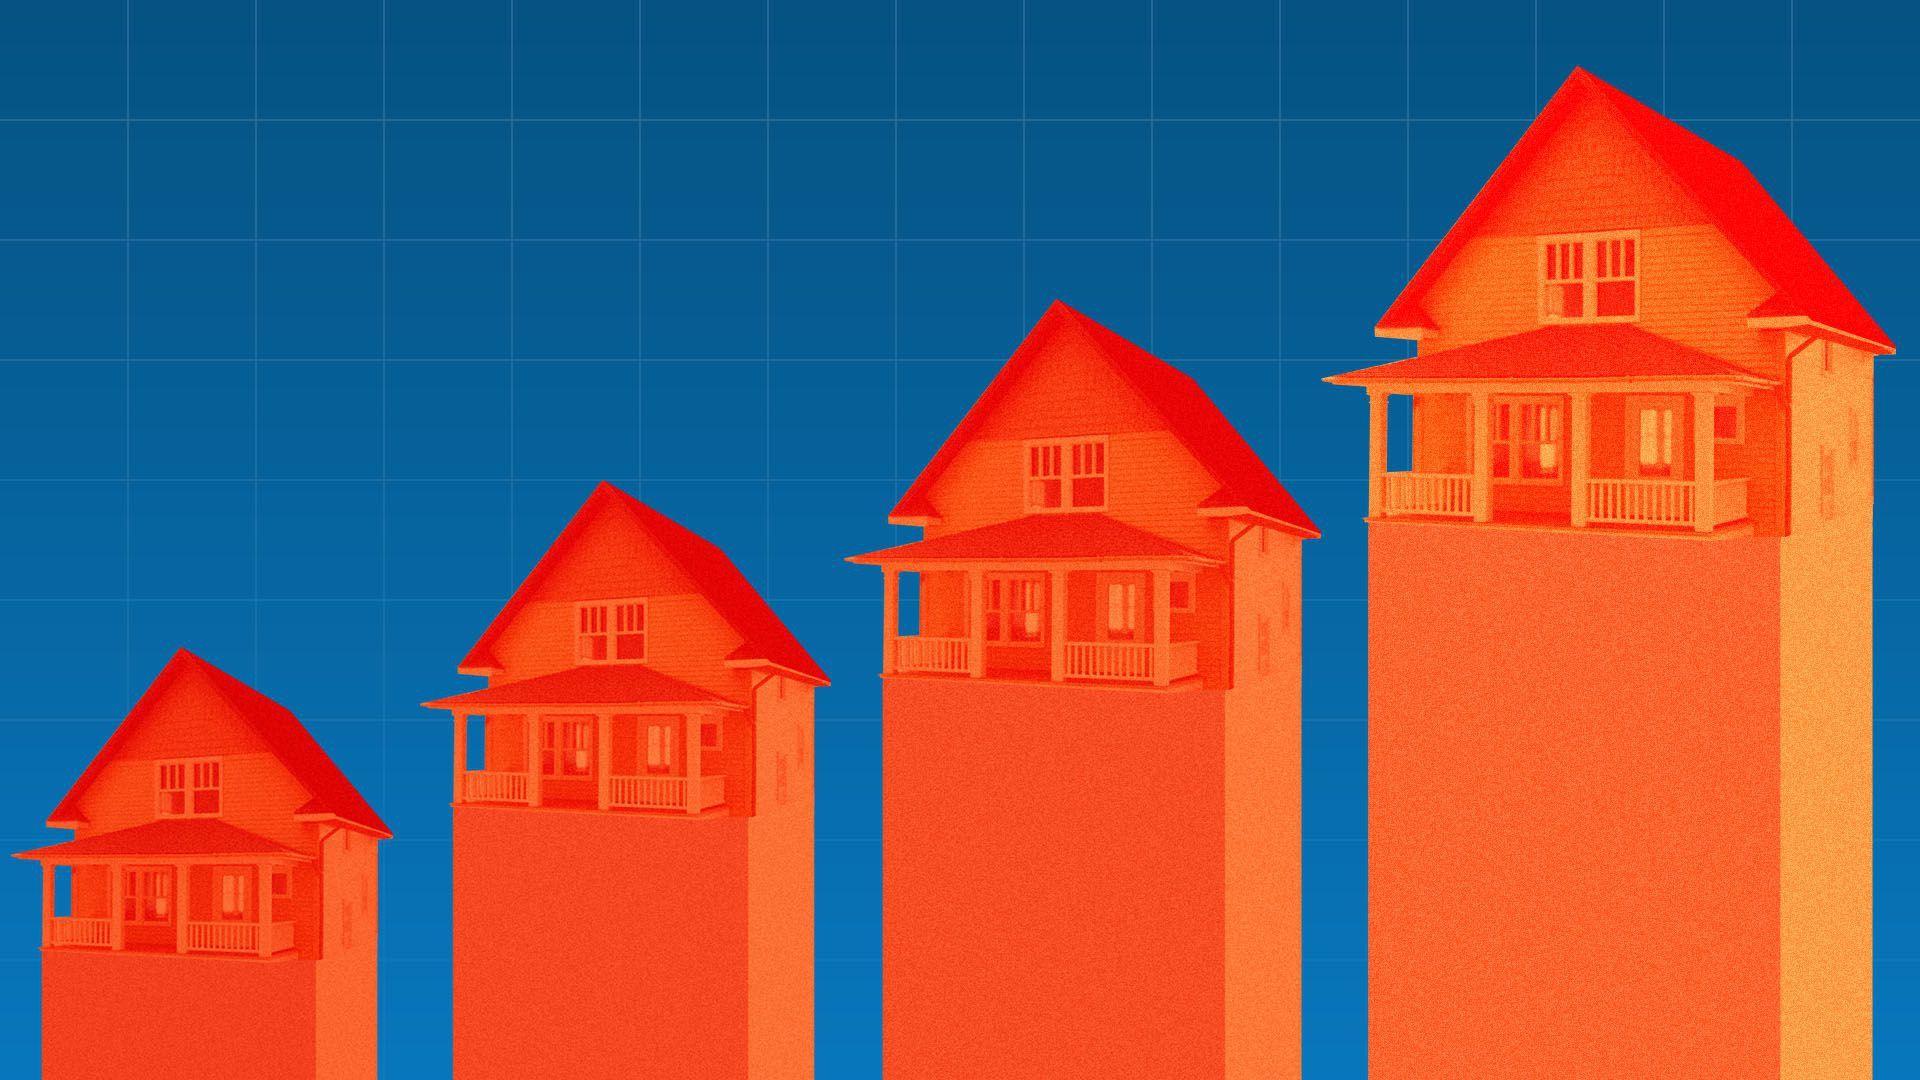 An illustration of houses rising higher.